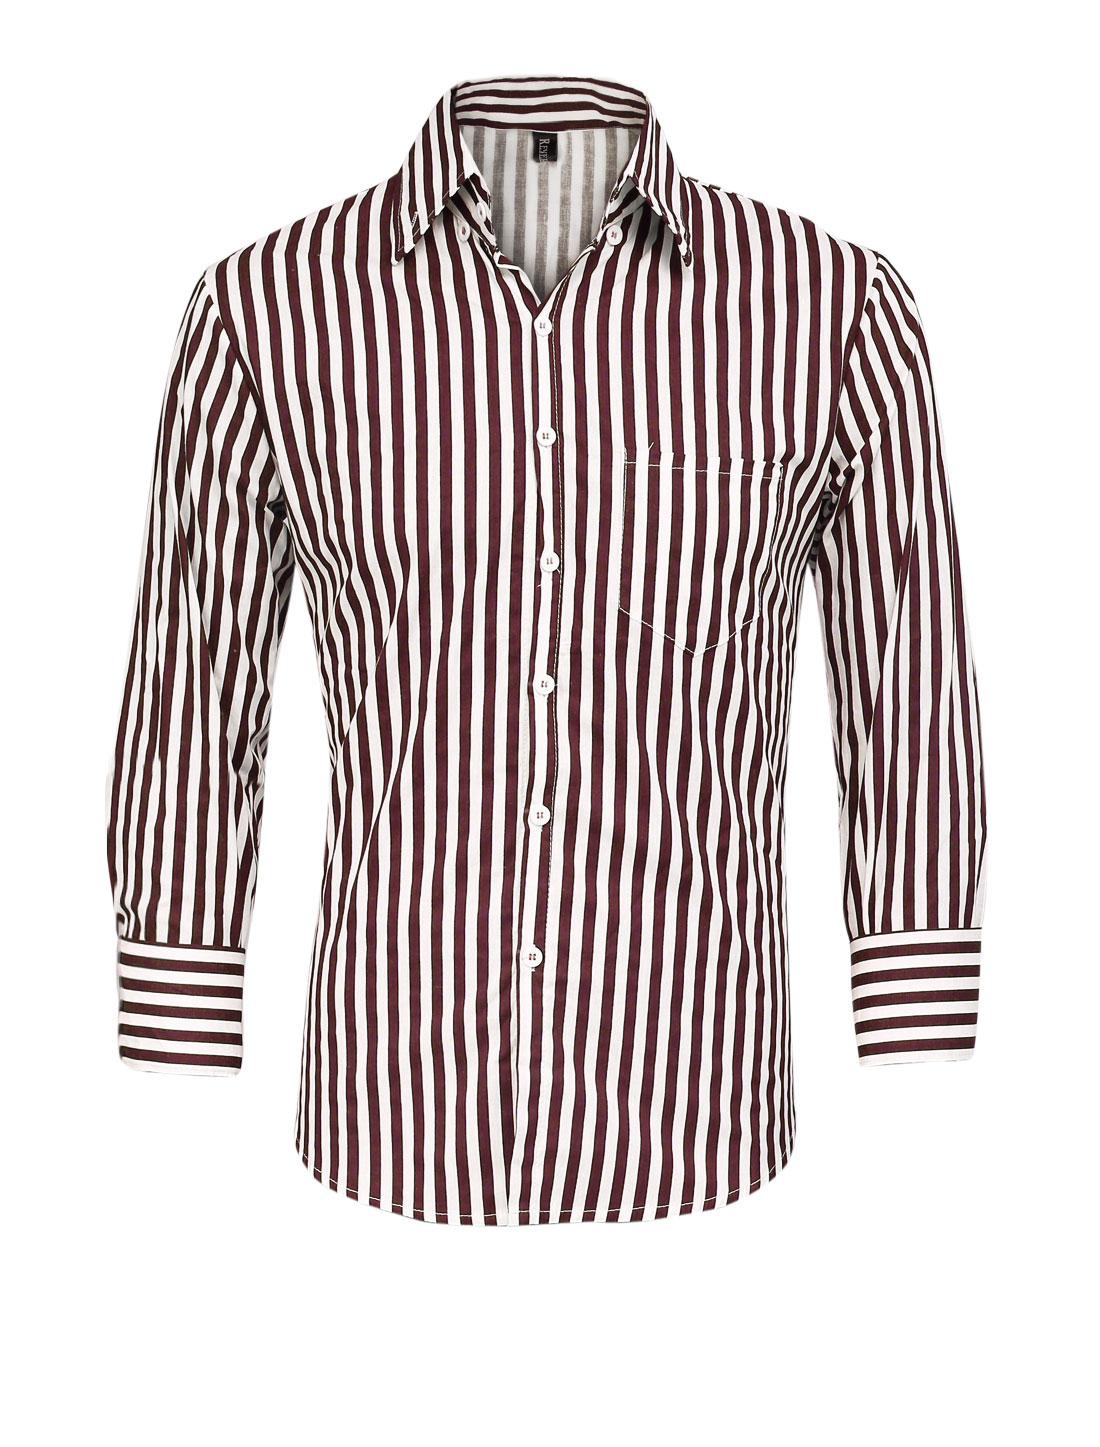 Men Breast Pocket Vertical Stripes Pattern Button Down Shirt Burgundy M